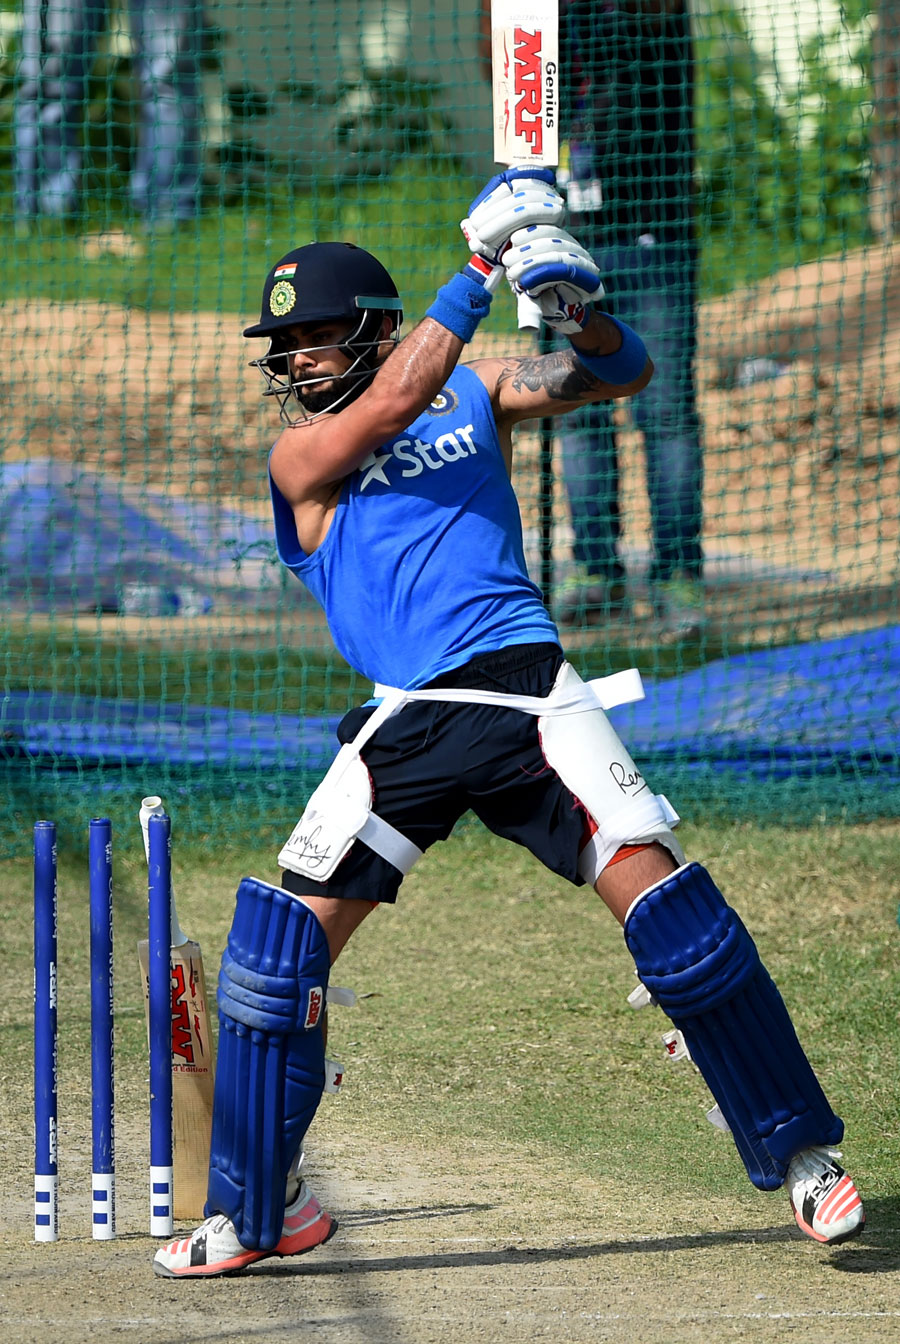 Virat Kohli bats in the nets | Cricket Photo | ESPN Cricinfo